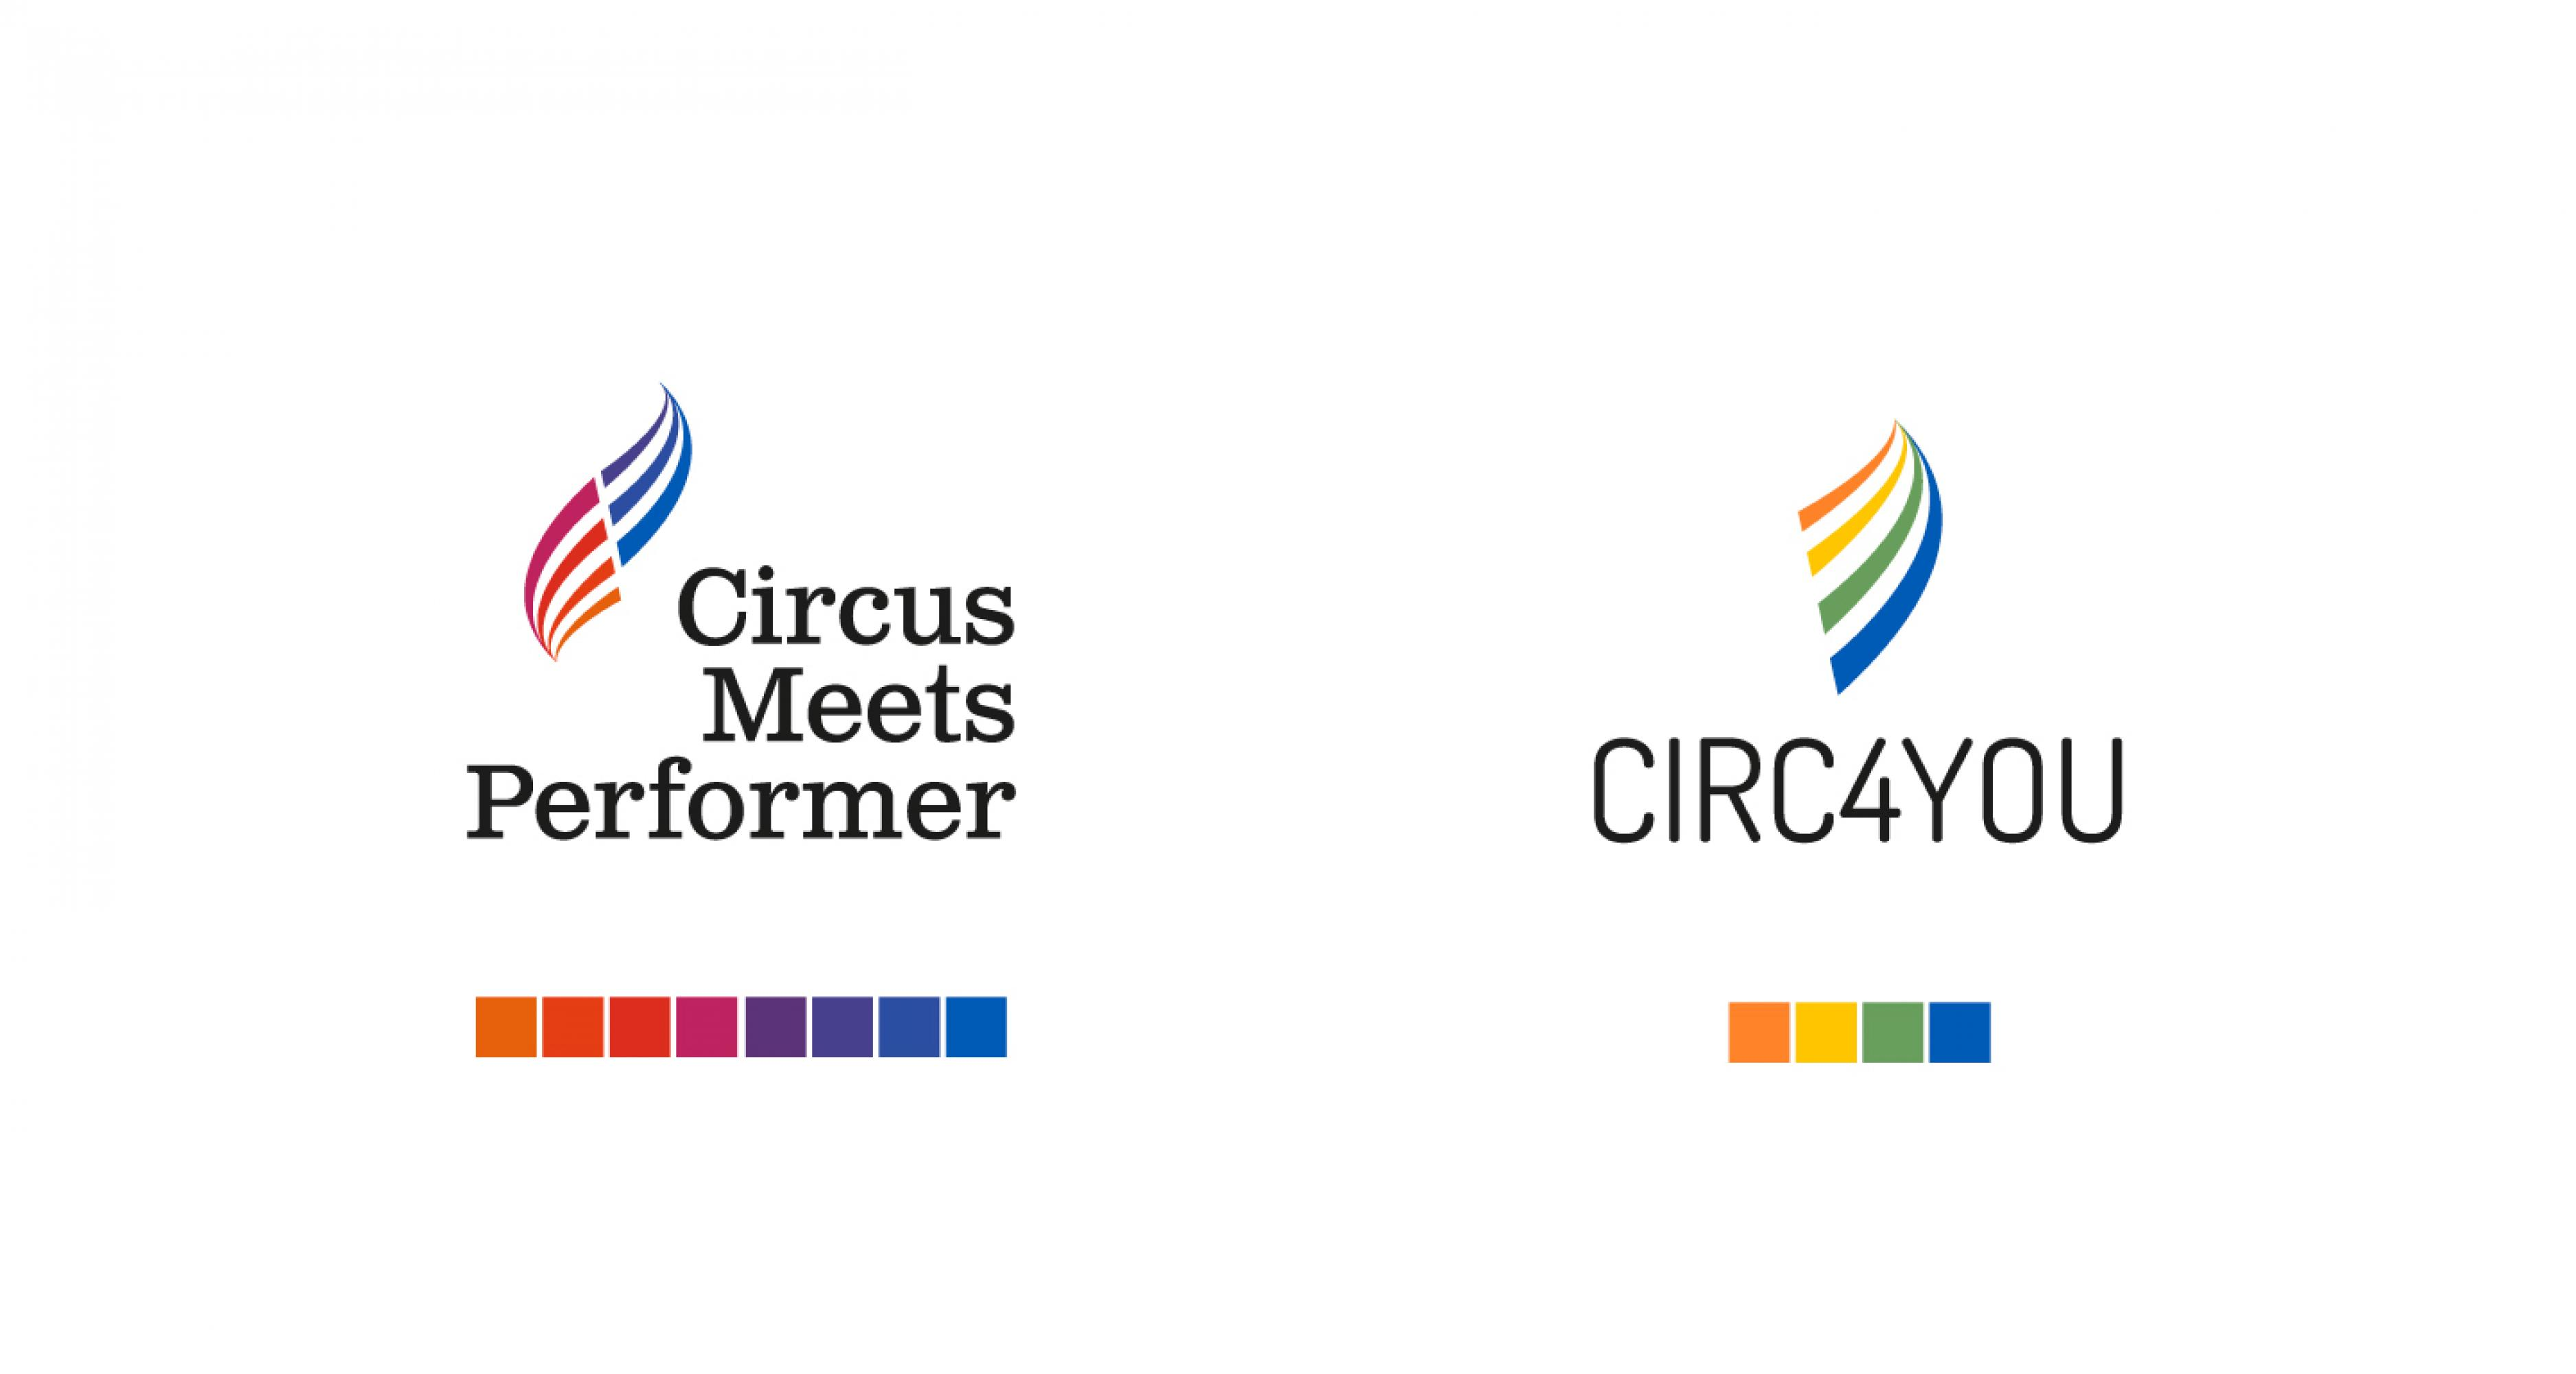 Corporate-Identity-Künstlerbranche-Logos